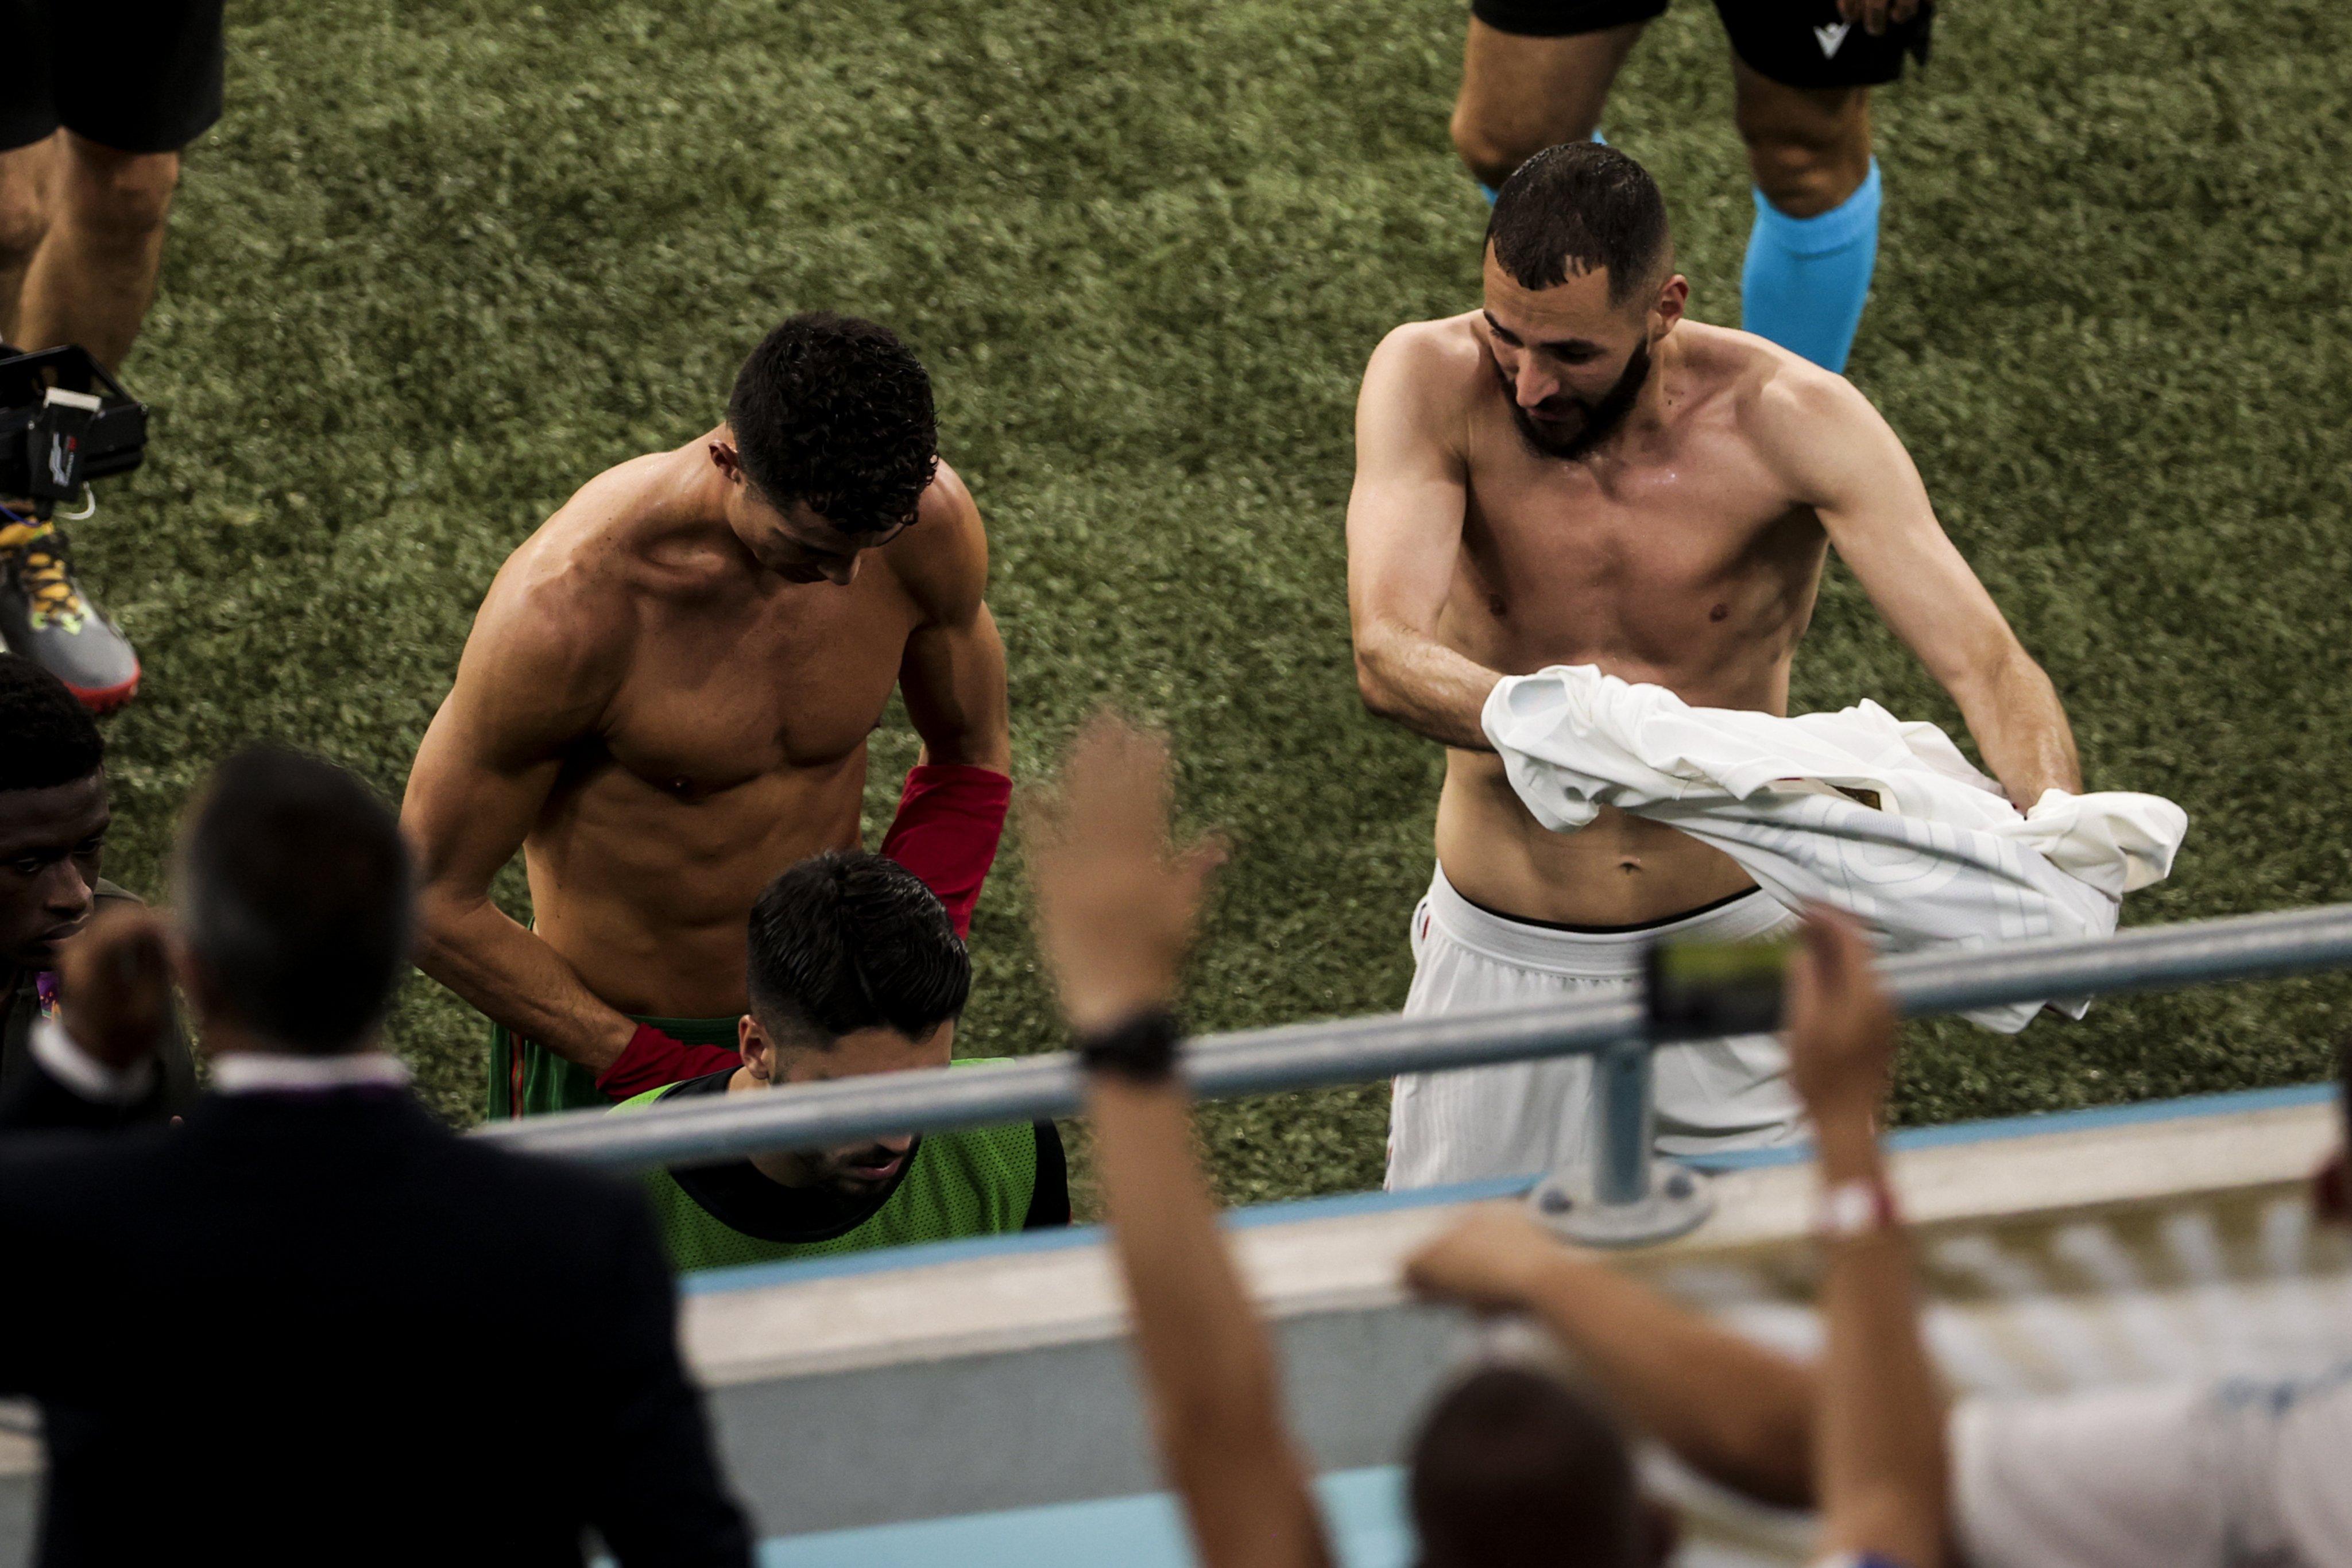 EURO 2020: Portugal vs France